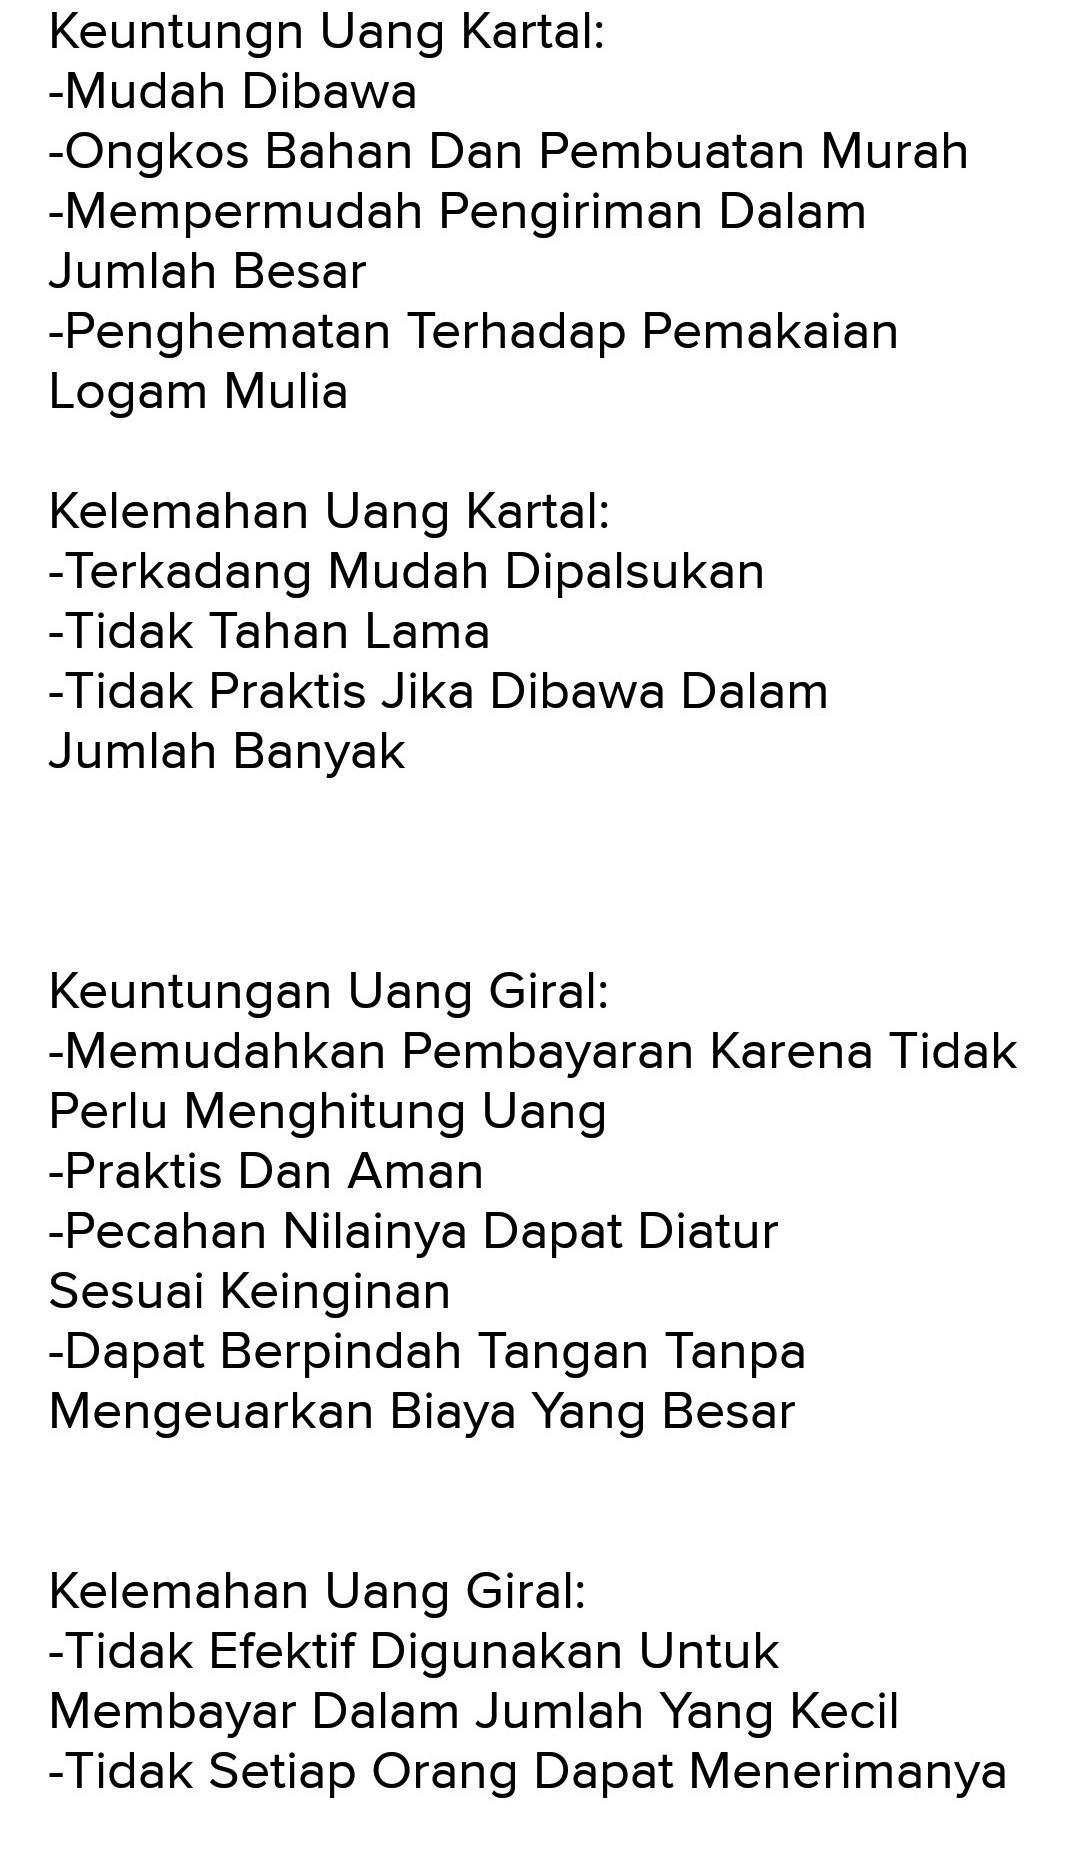 Jenis-jenis uang - Wikipedia bahasa Indonesia